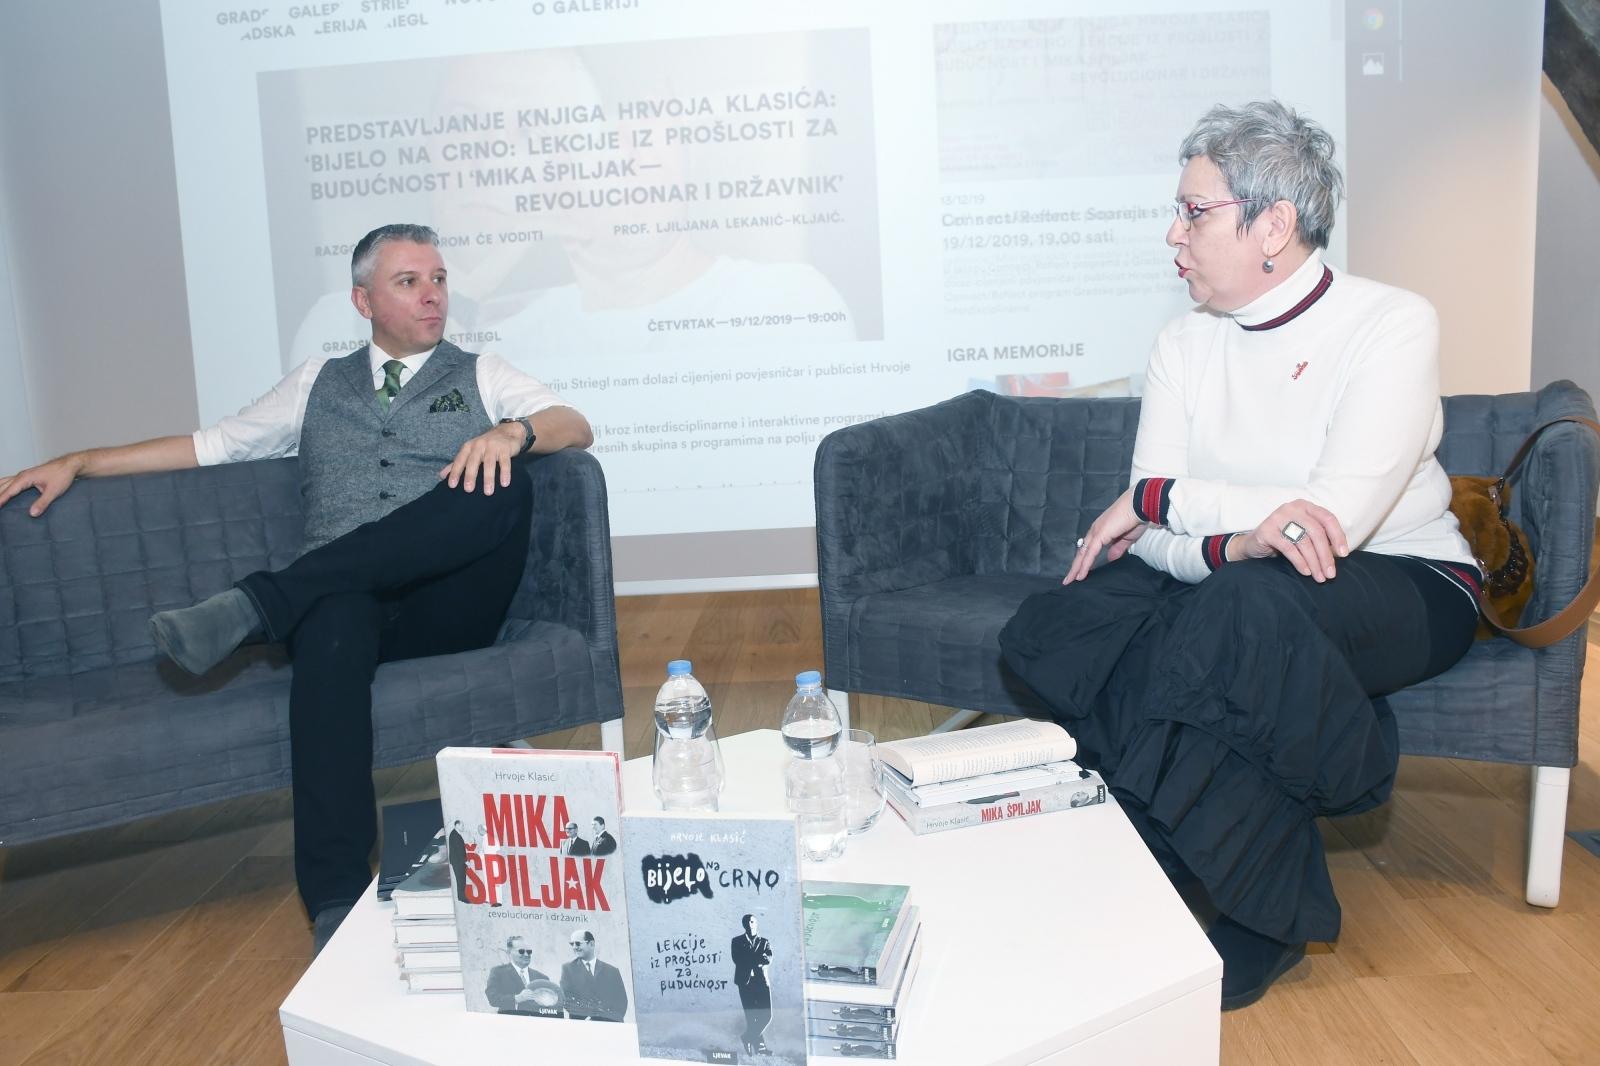 Večernje posijelo s povjesničarem i publicistom Hrvojem Klasićem